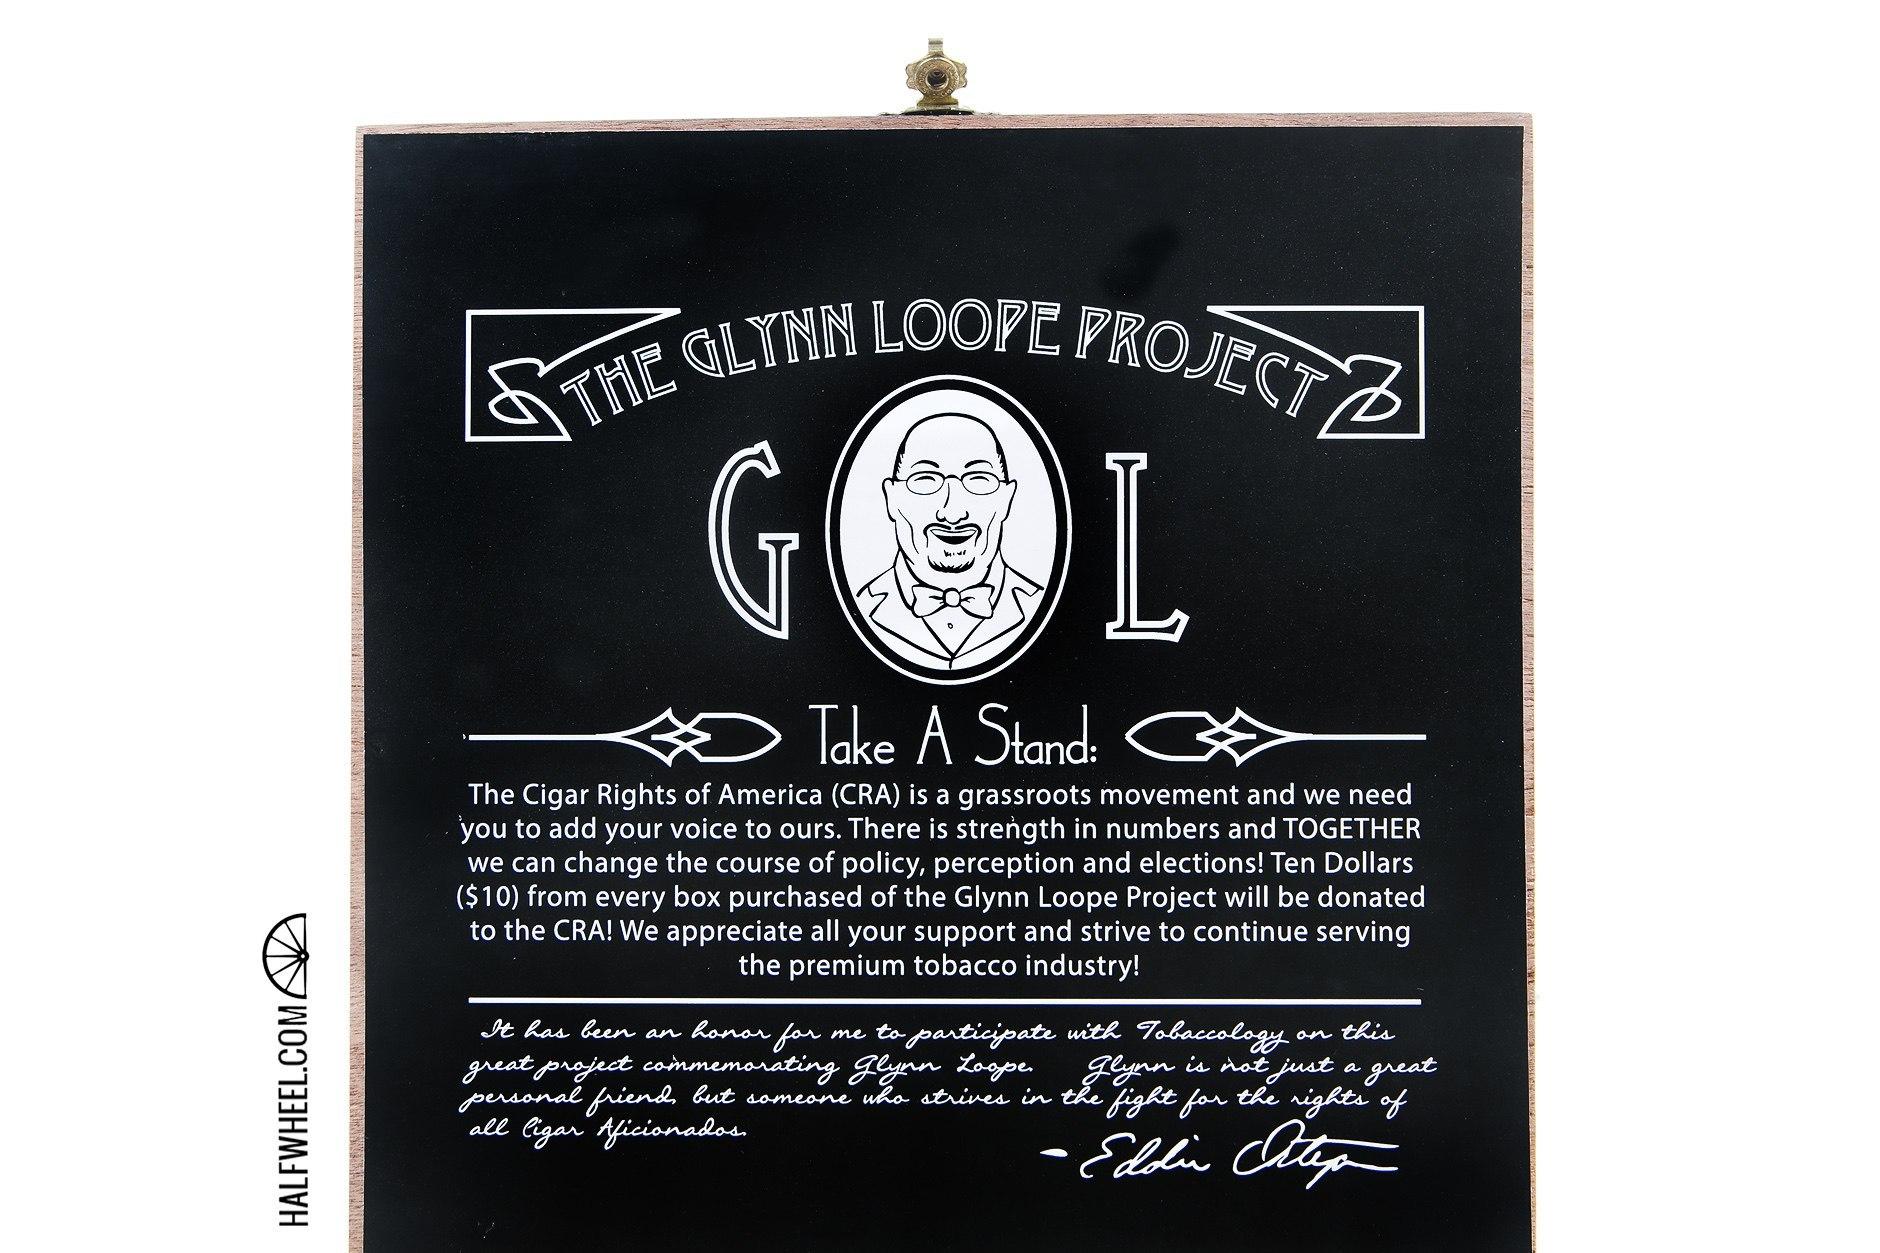 Ortega The Glynn Loope Project Box 3